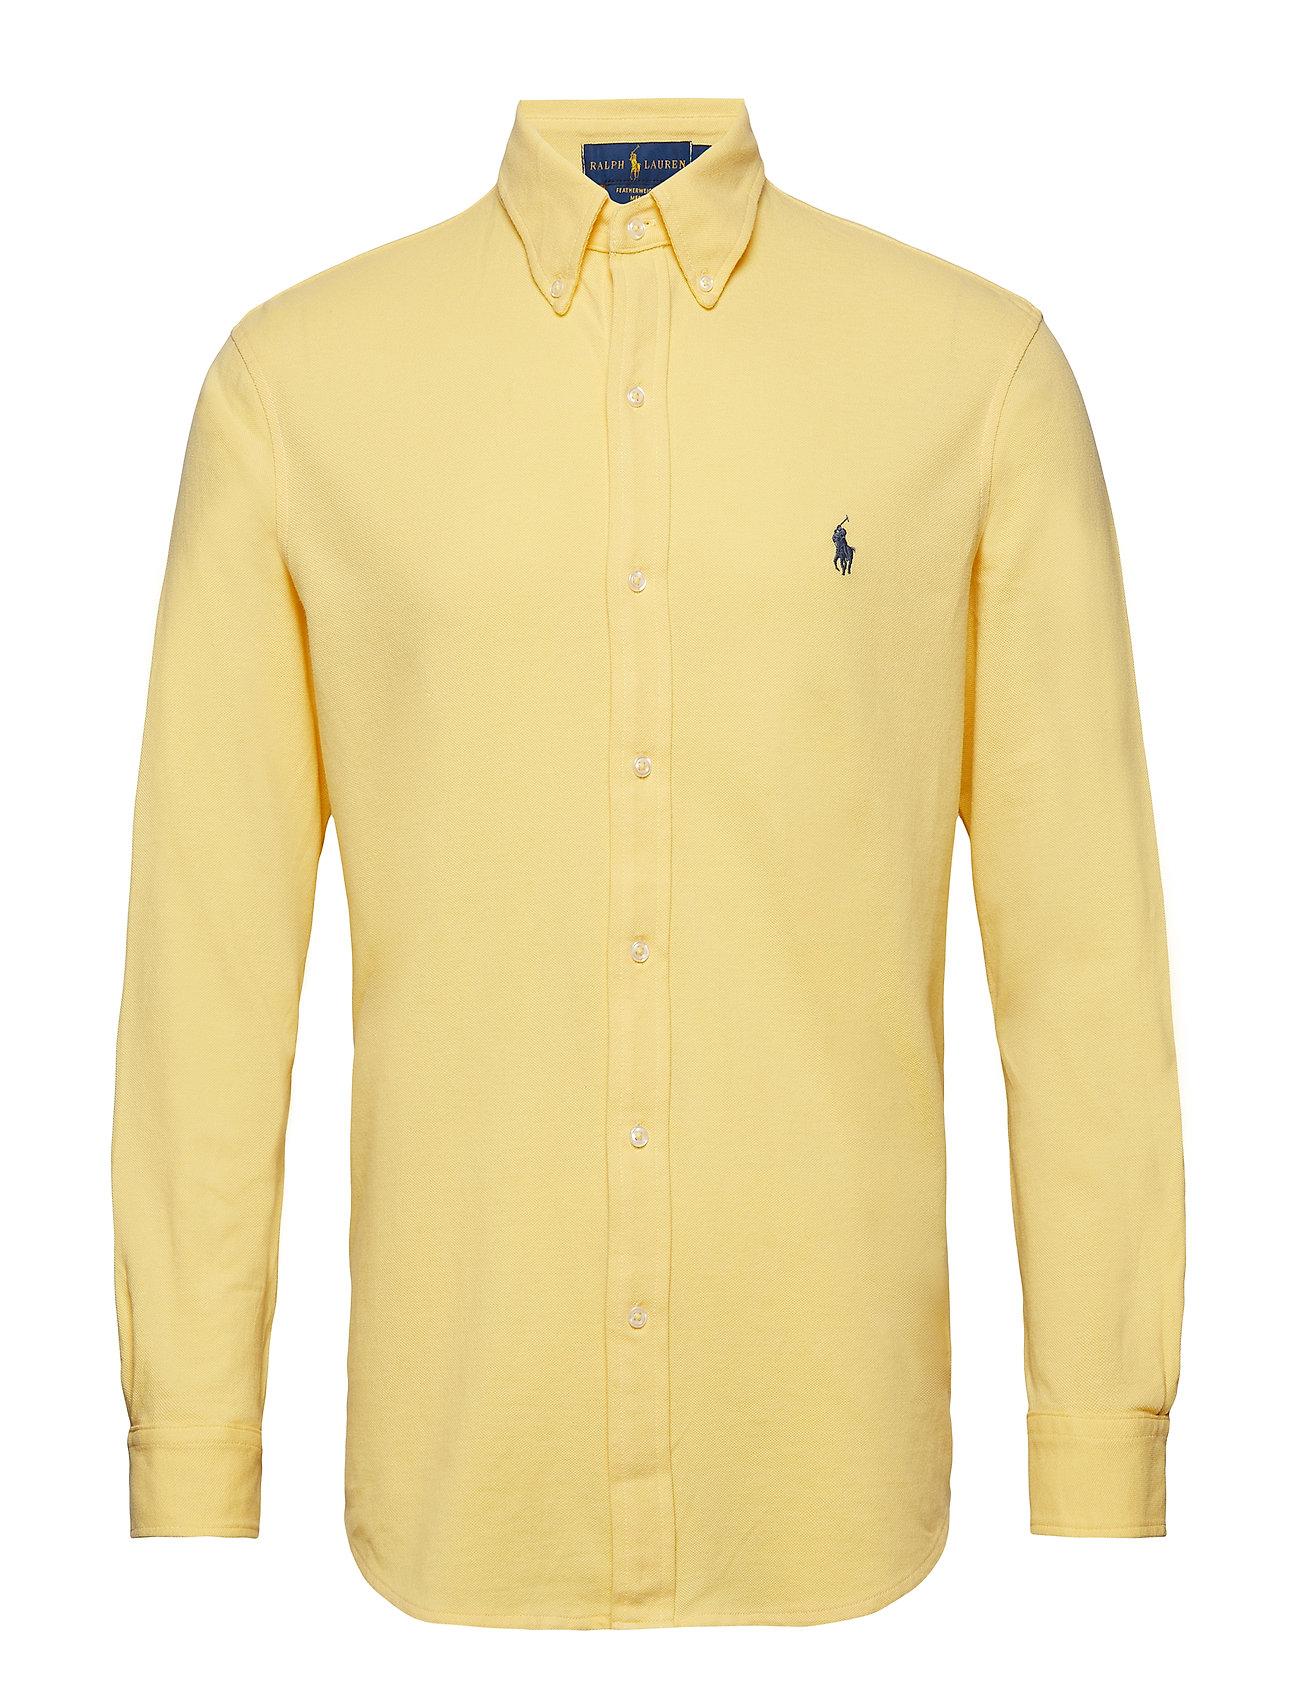 Polo Ralph Lauren Featherweight Mesh Shirt - EMPIRE YELLOW